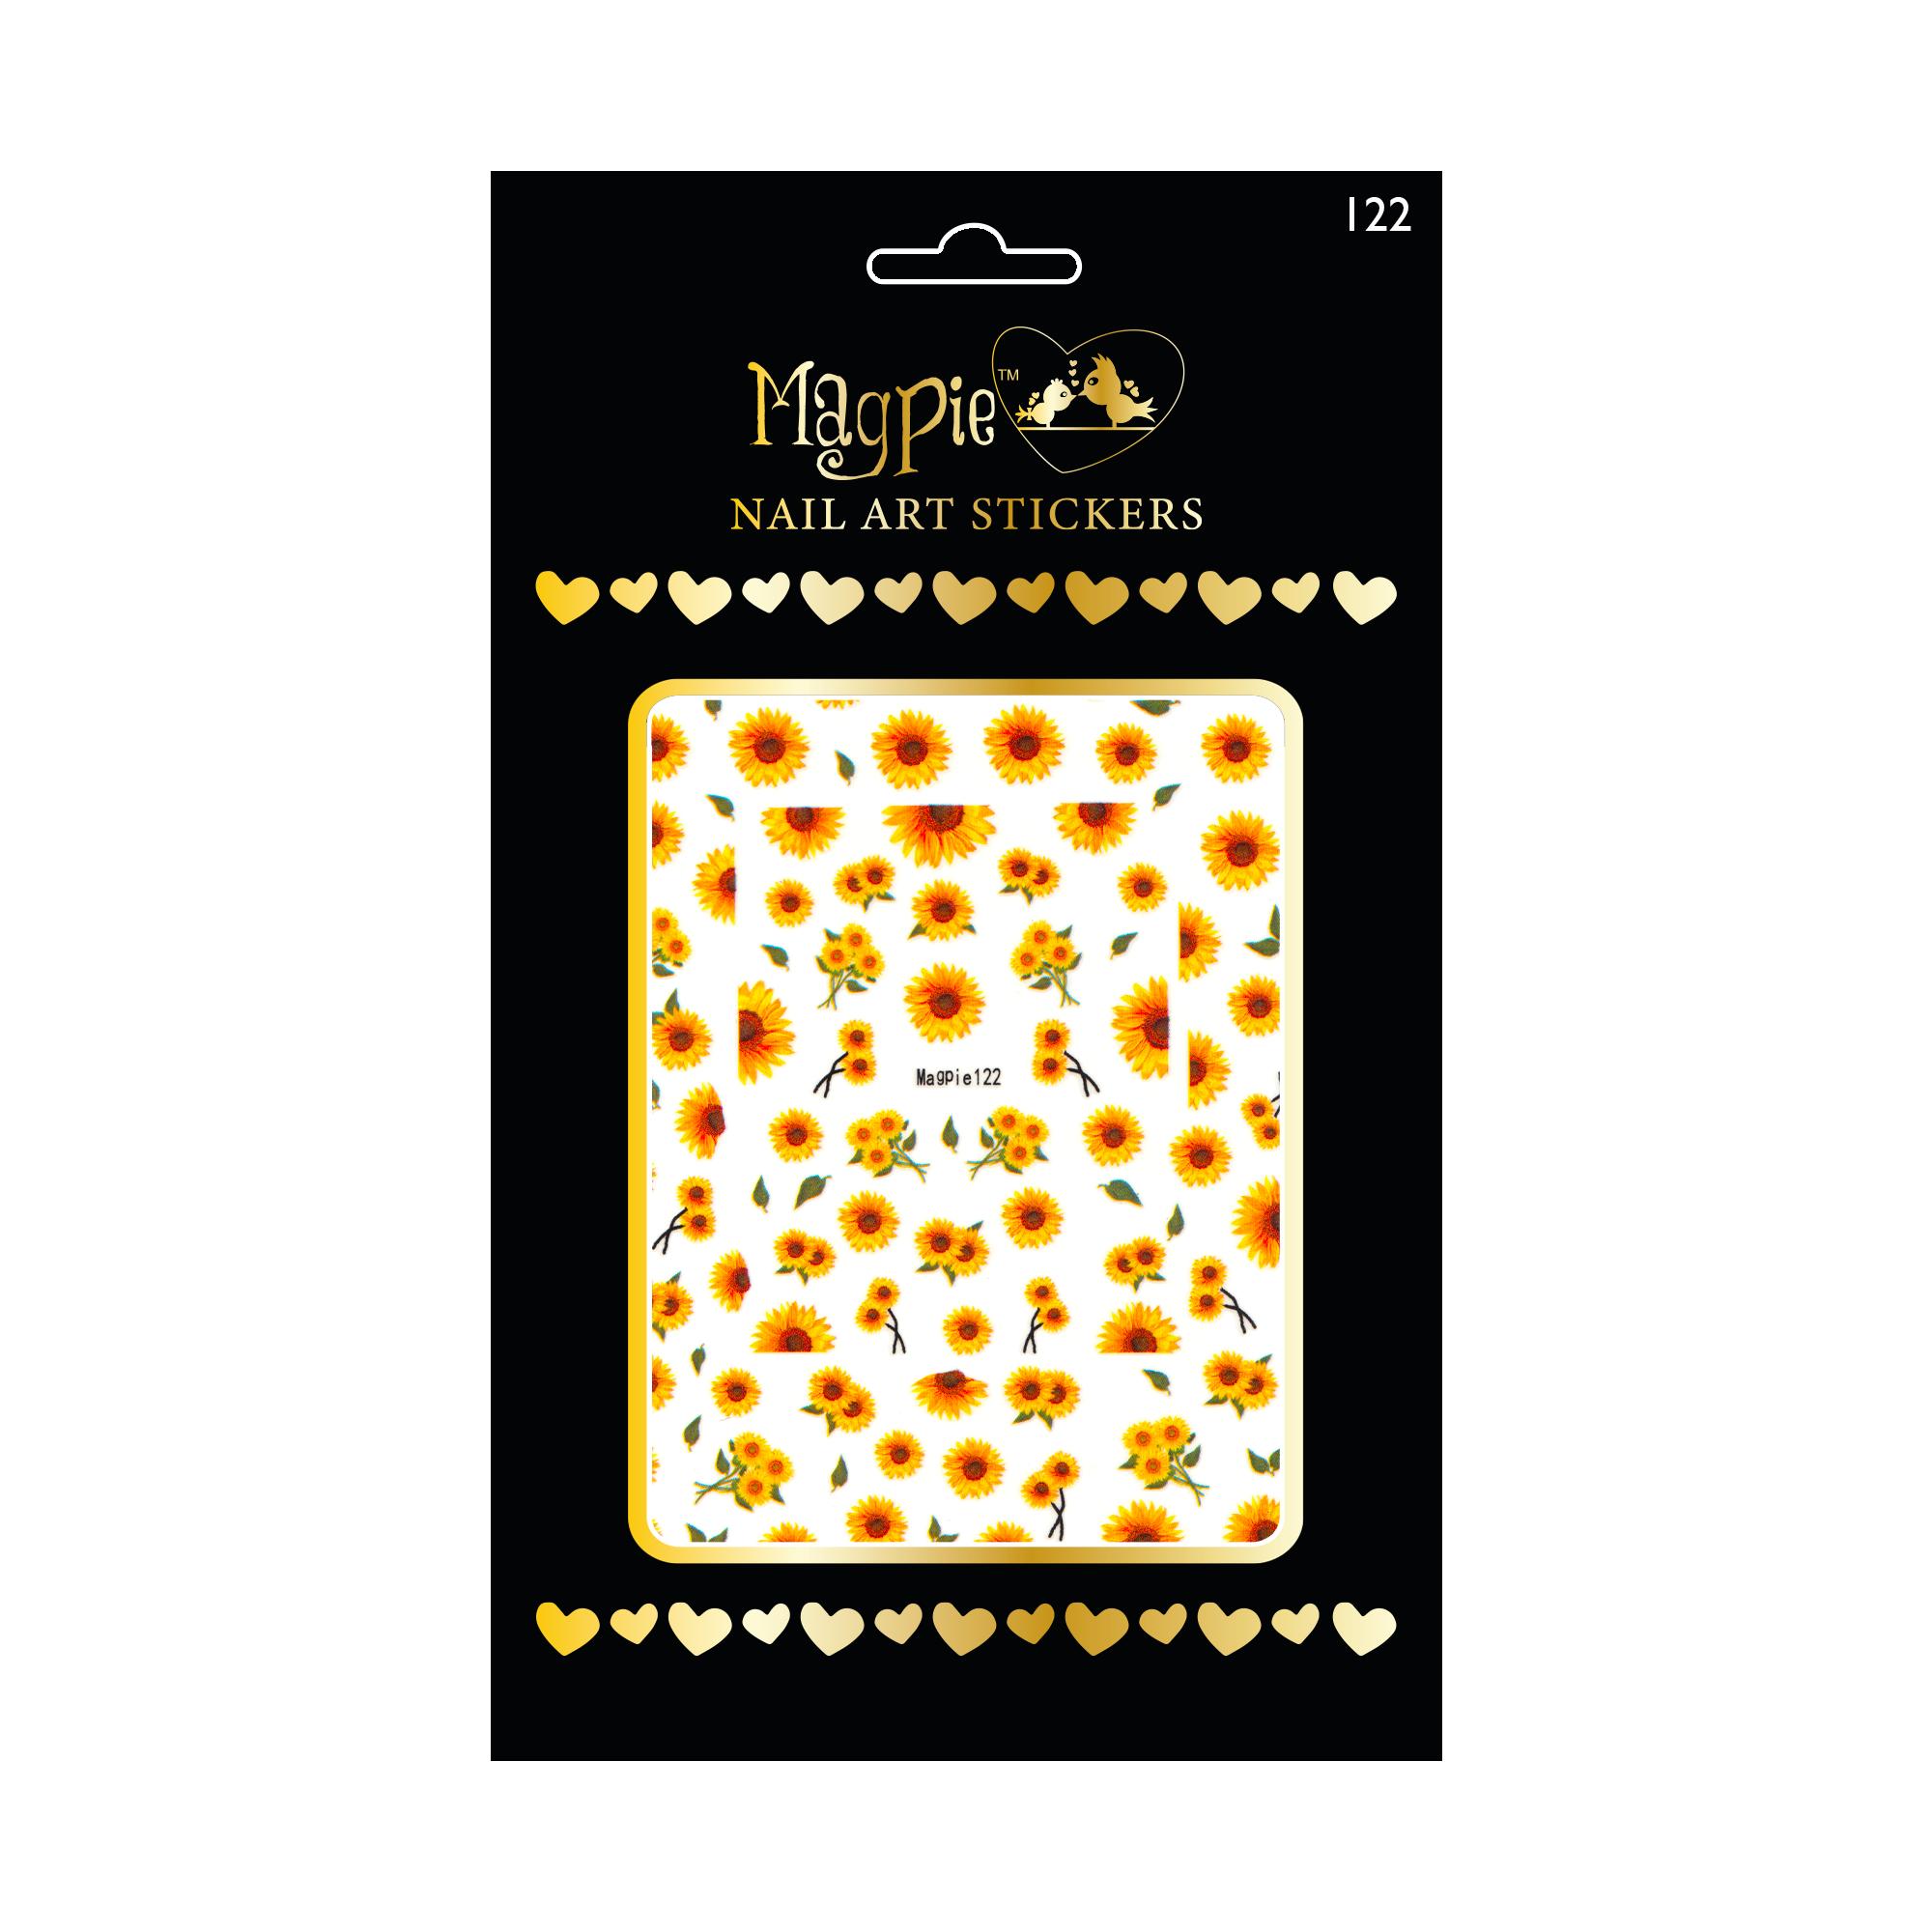 Magpie 122 stickers